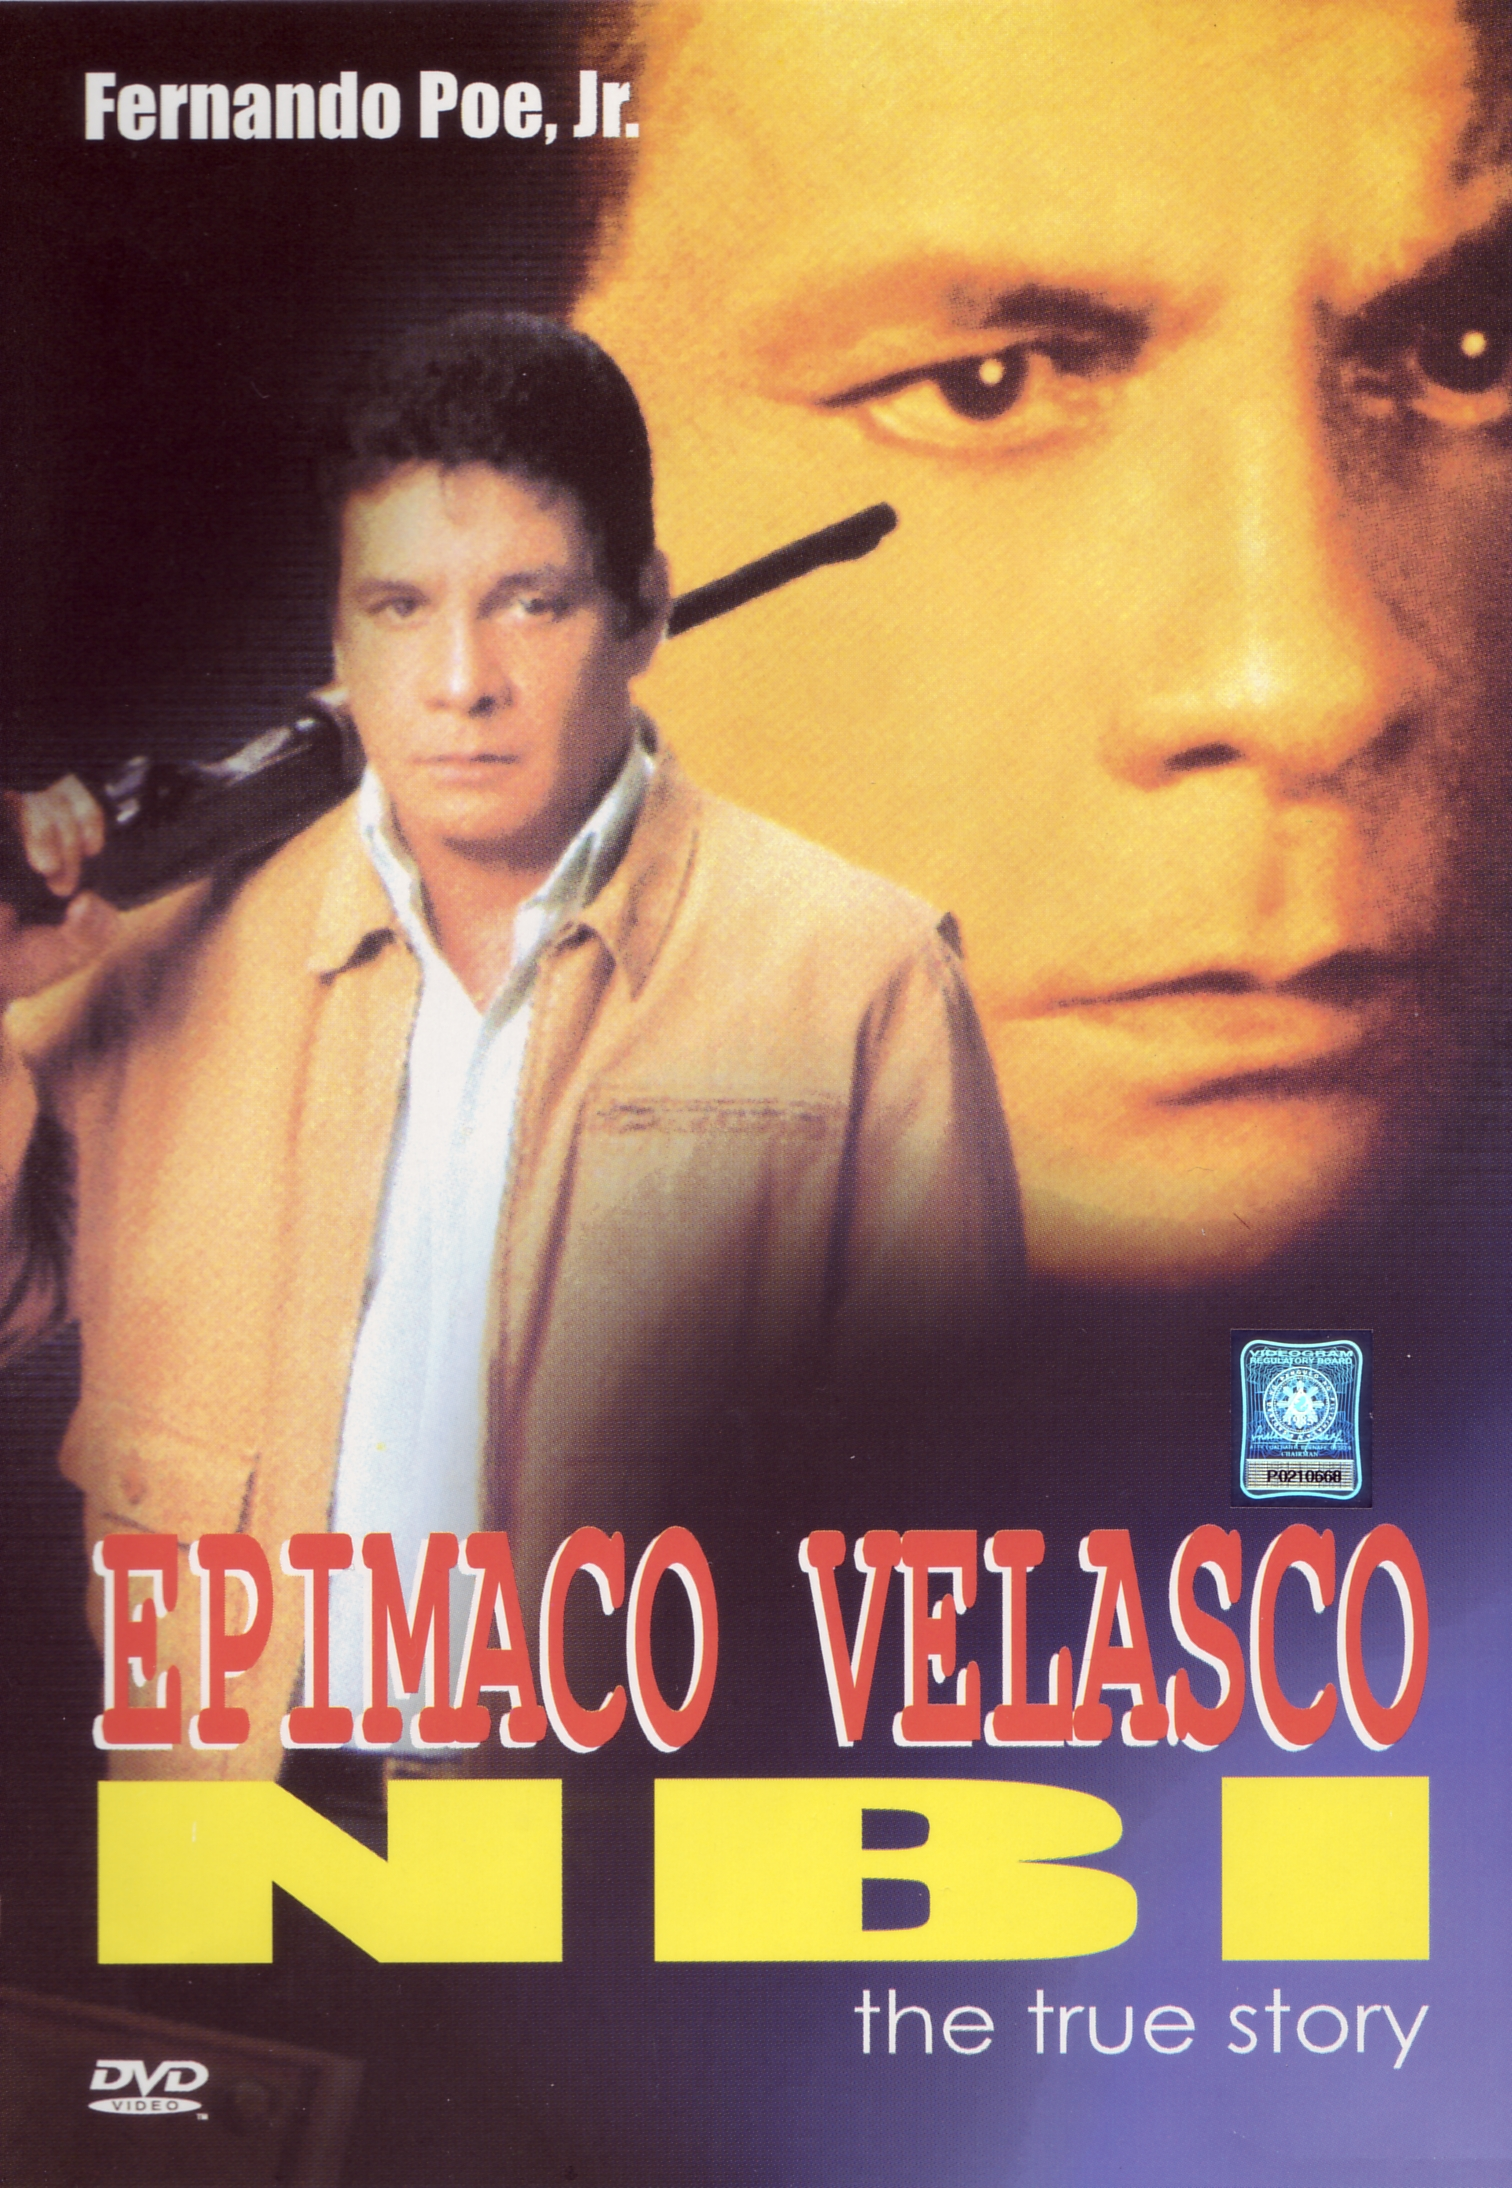 Epimaco Velasco